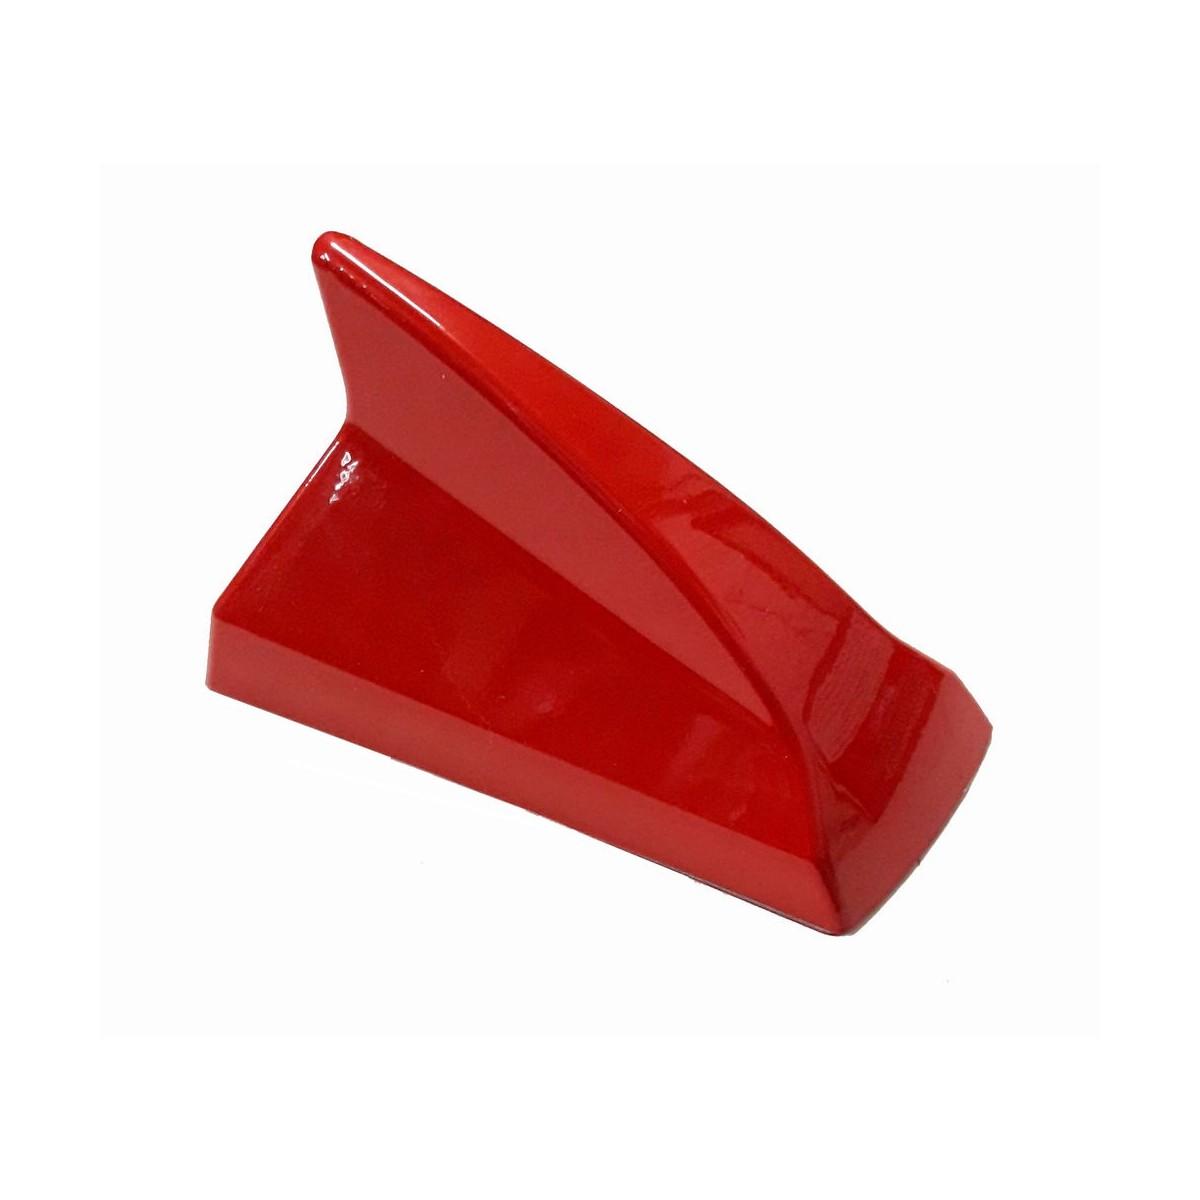 Antena Externa - Shark (Vermelha)